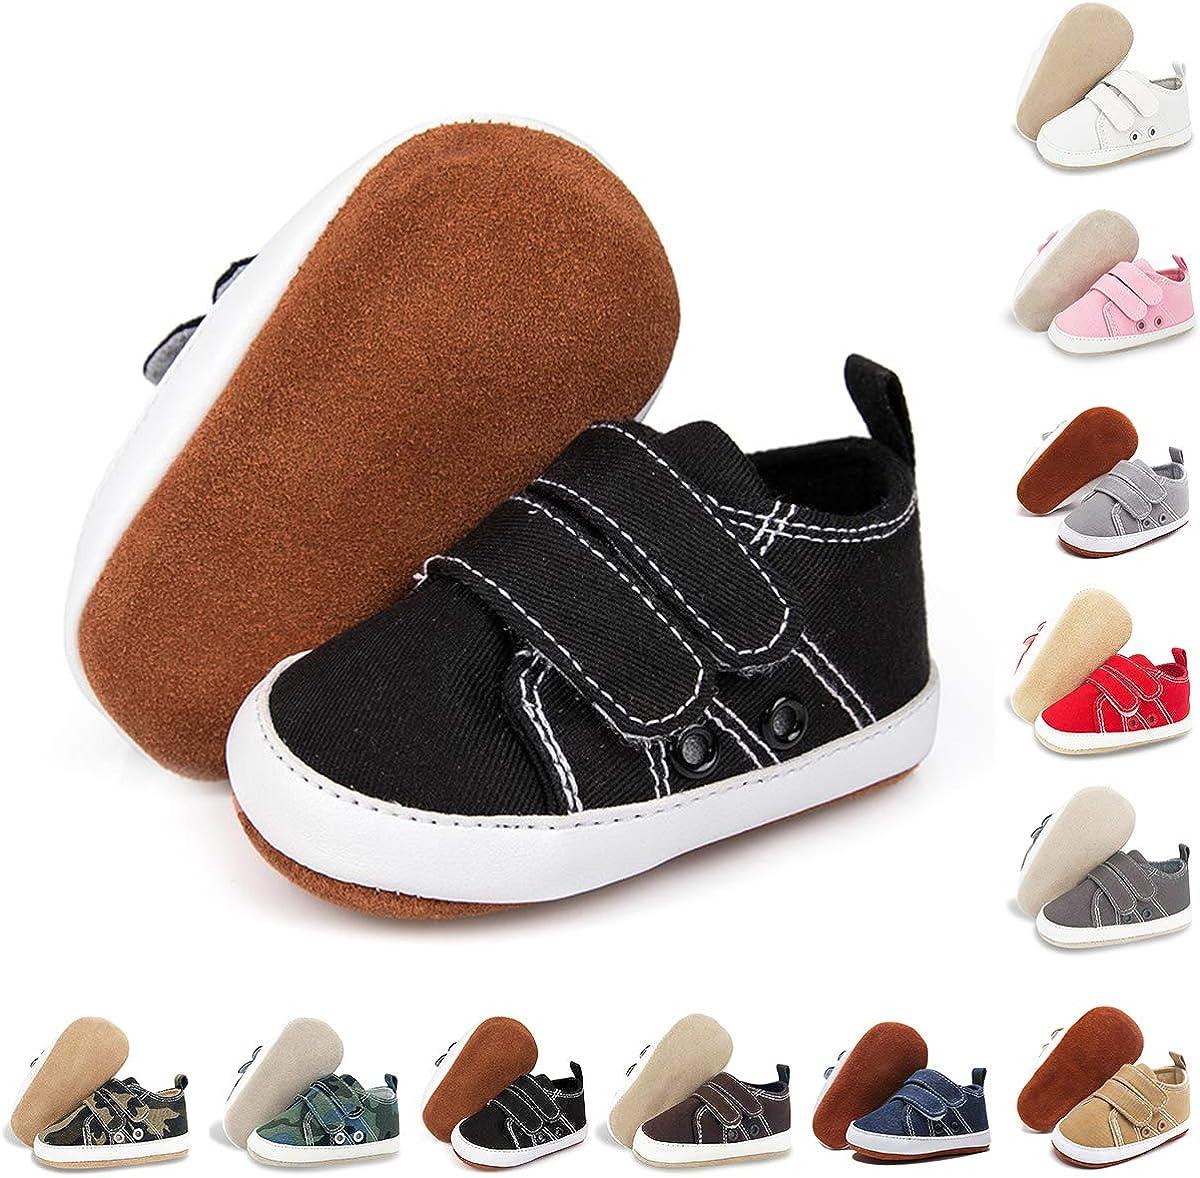 Boston Mall BENHERO Baby Boys Girls Shoes Oakland Mall Leathe 100% Infant Canvas Sneakers